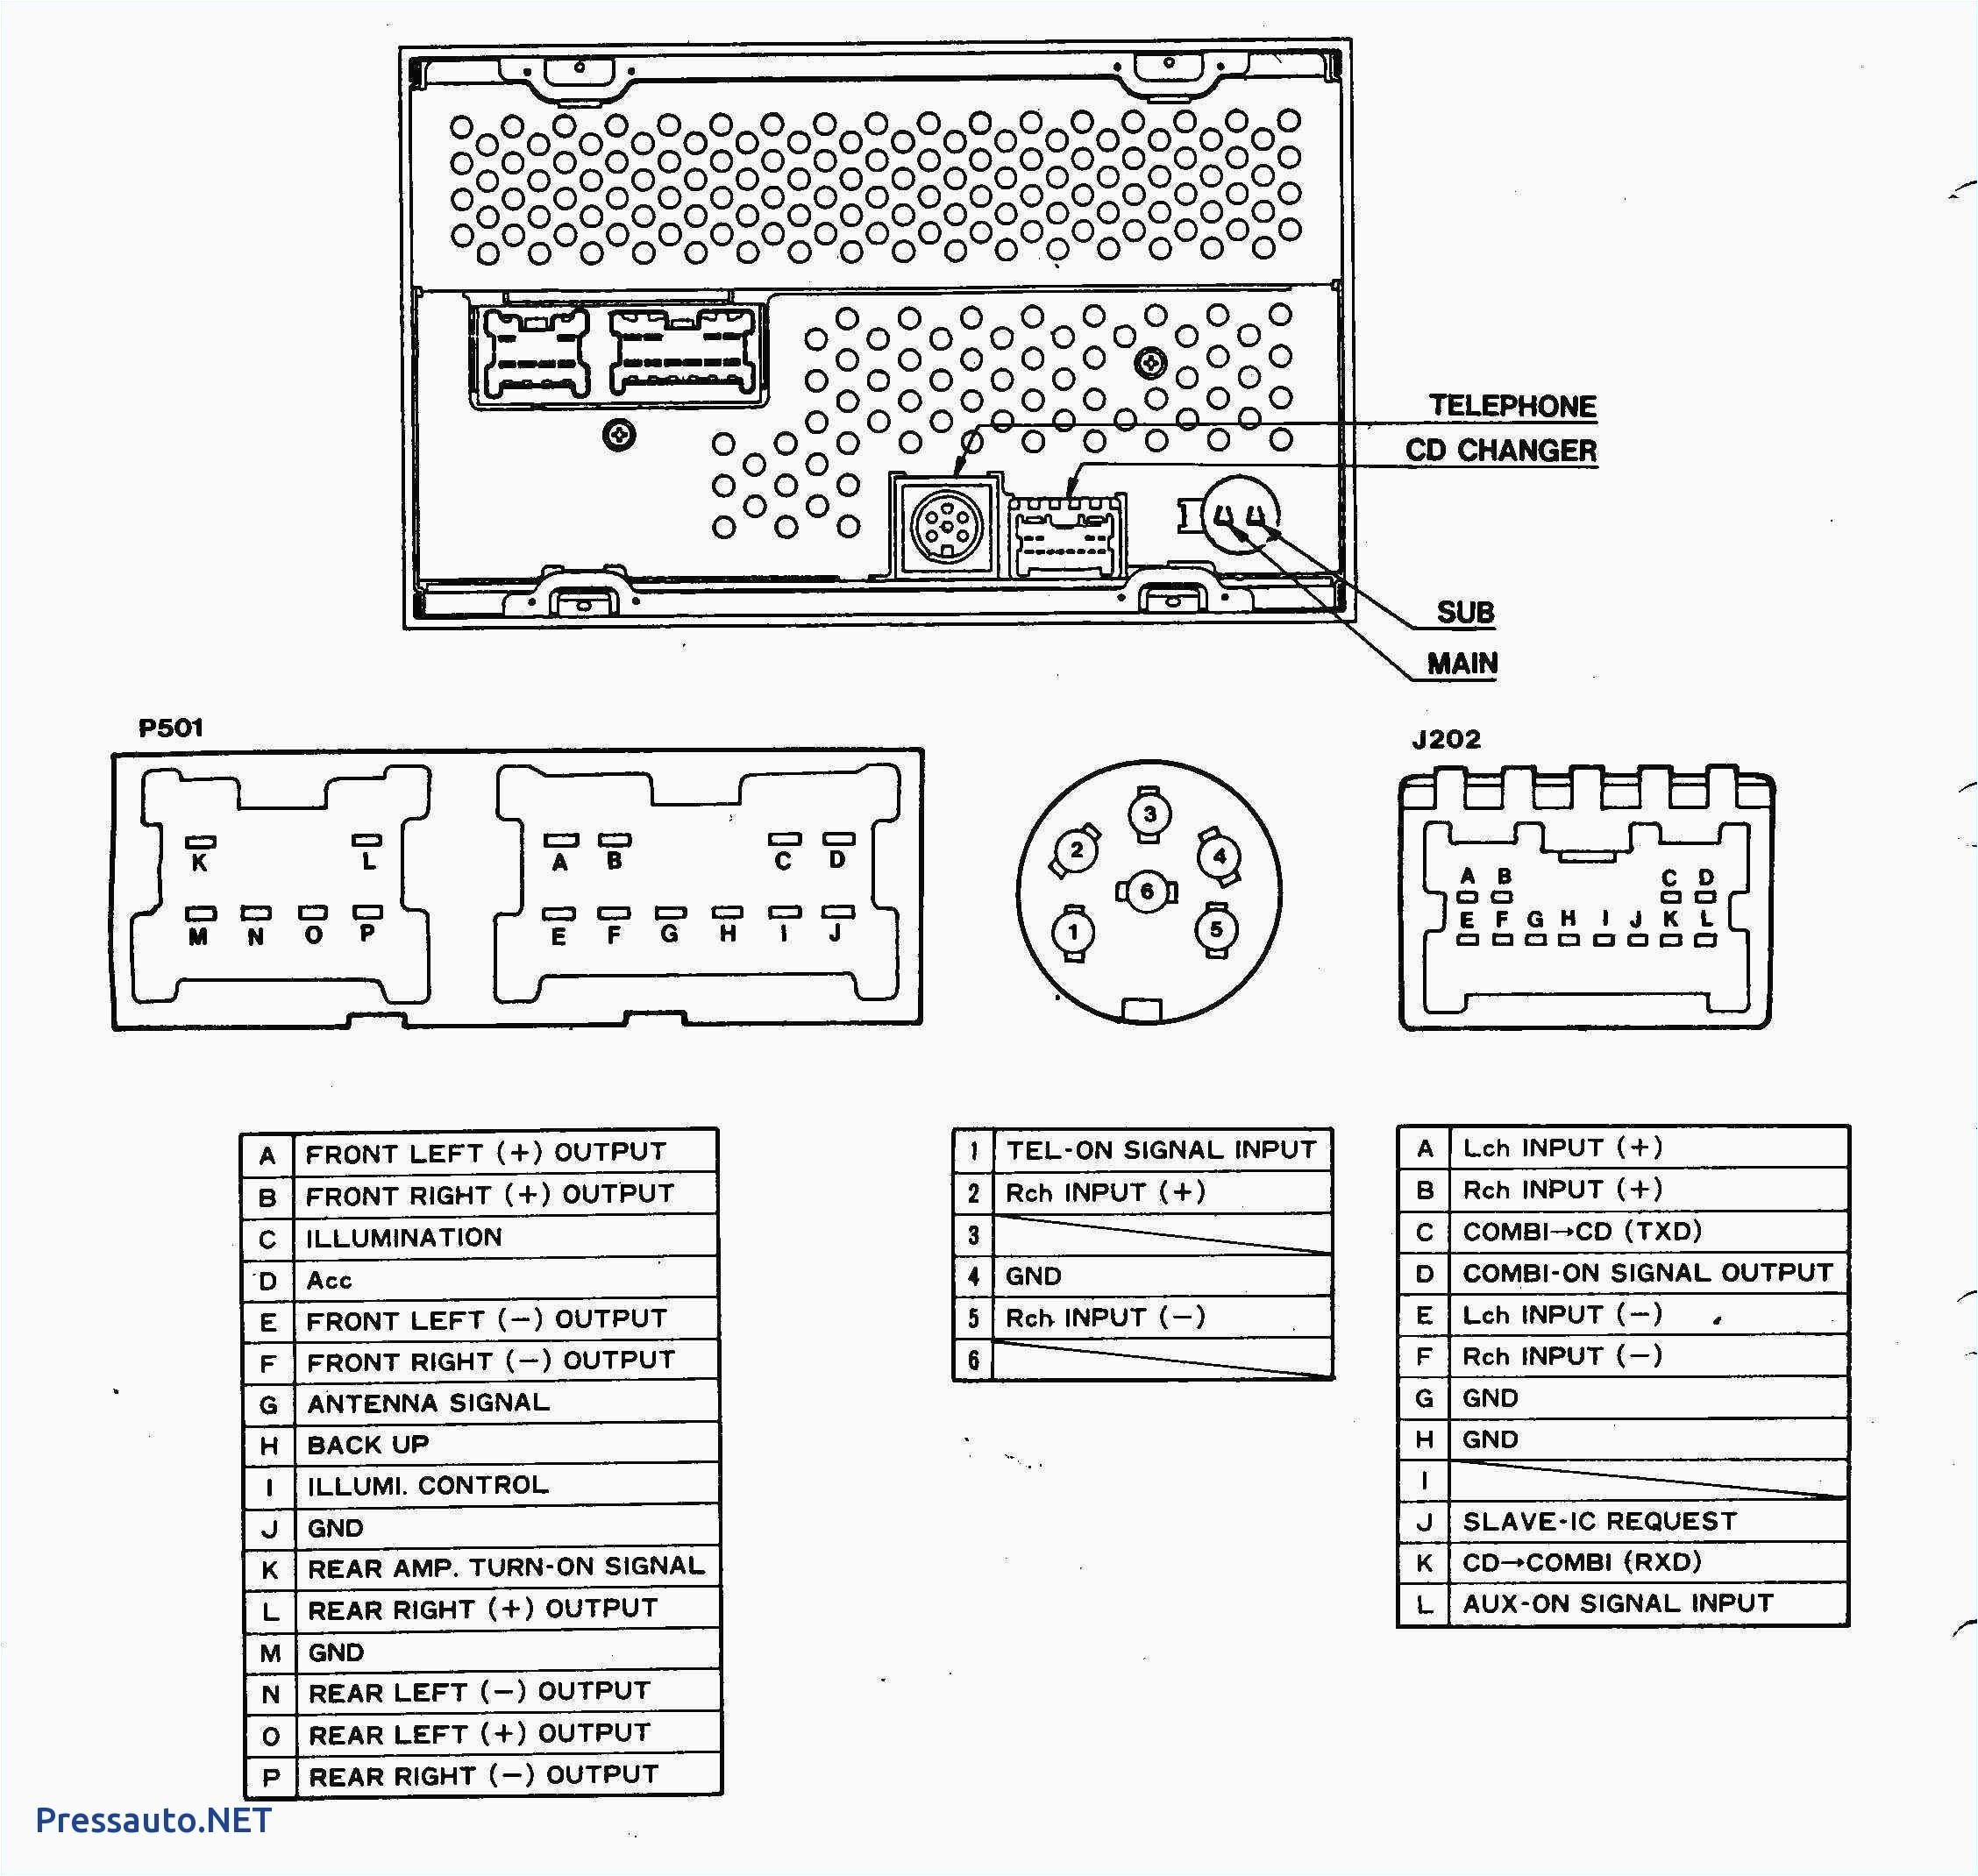 2004 bmw e46 radio wiring diagram wiring diagram reviewbmw e46 stereo wiring harness wiring diagram article